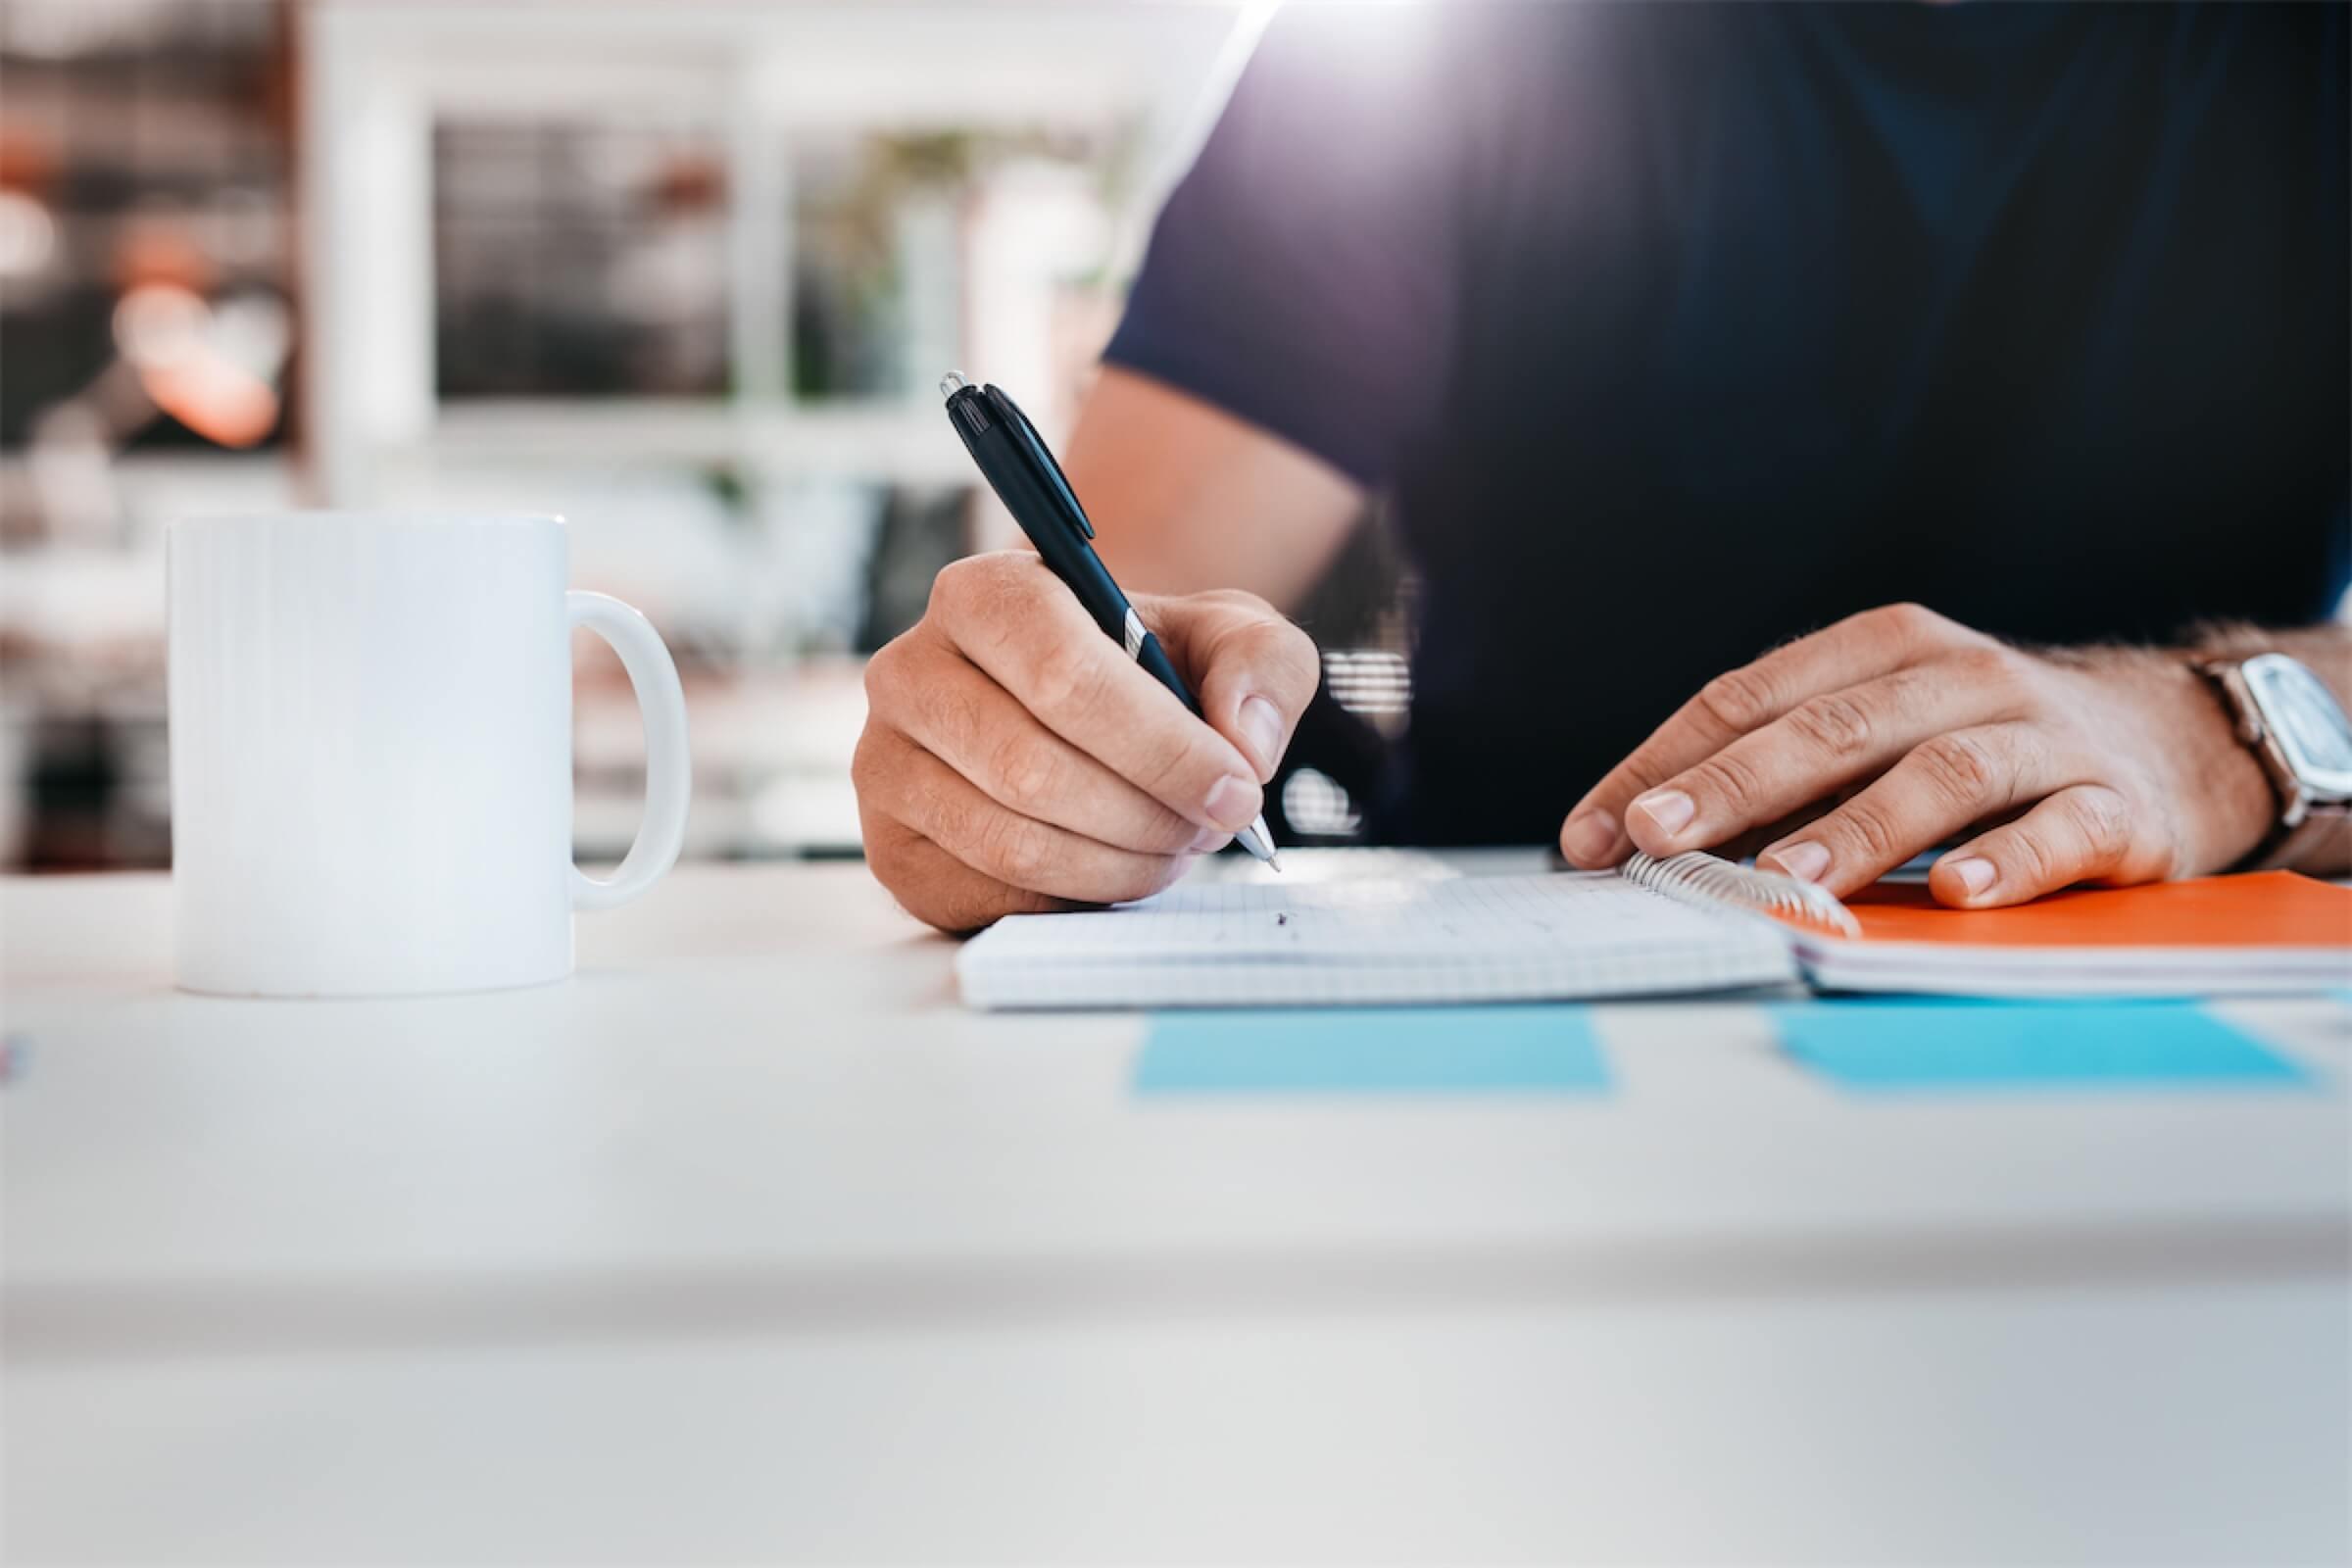 Closeup of hands writing notes